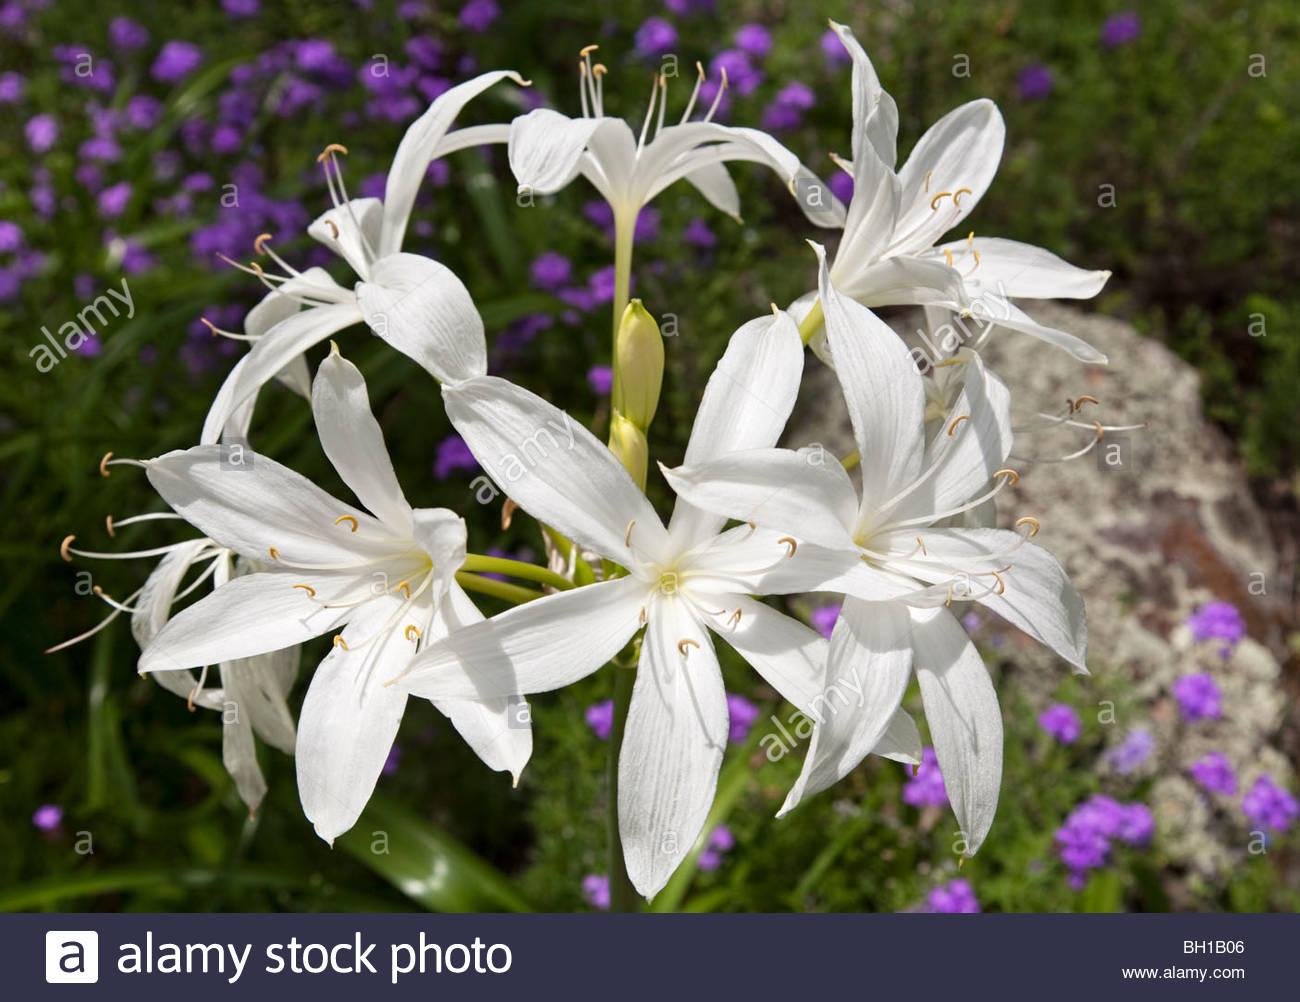 Murray Lily (Crinum flaccidum) , Kwiambal National Park, New South Wales, Australia - Stock Image